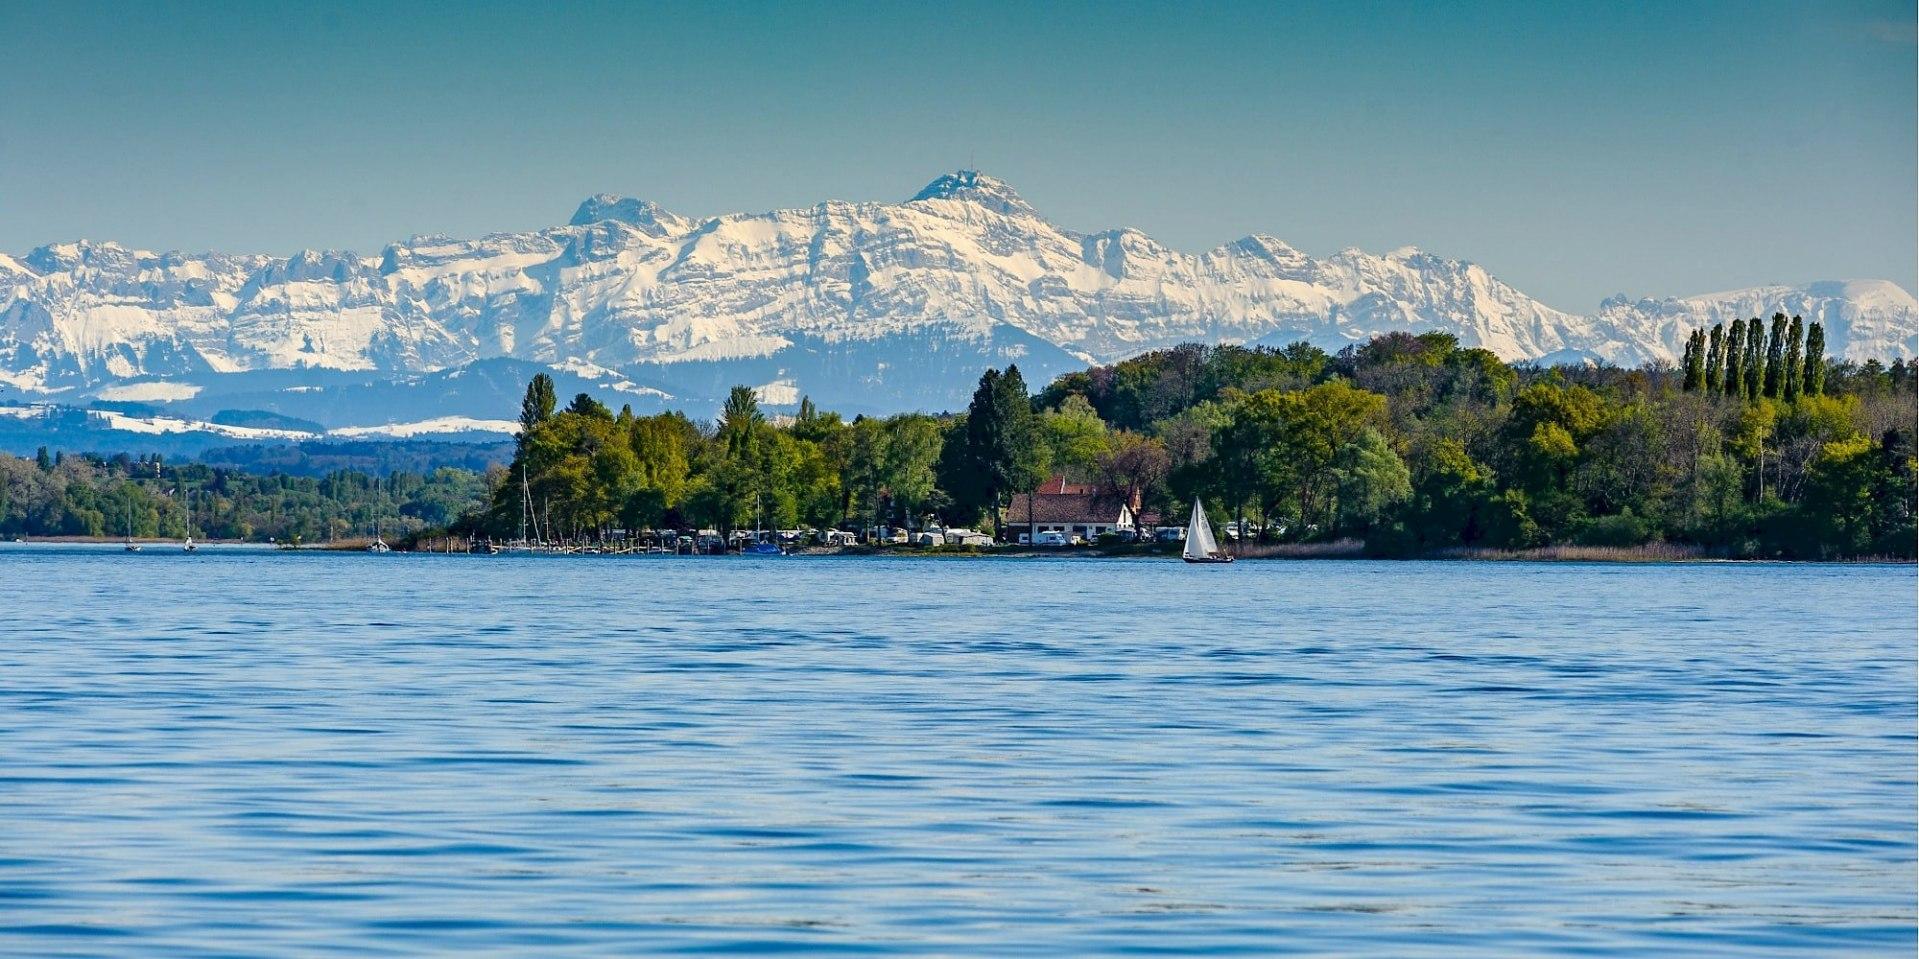 bodensee karte campingplätze Campingplätze am Bodensee und Infos zu Camping am Bodensee